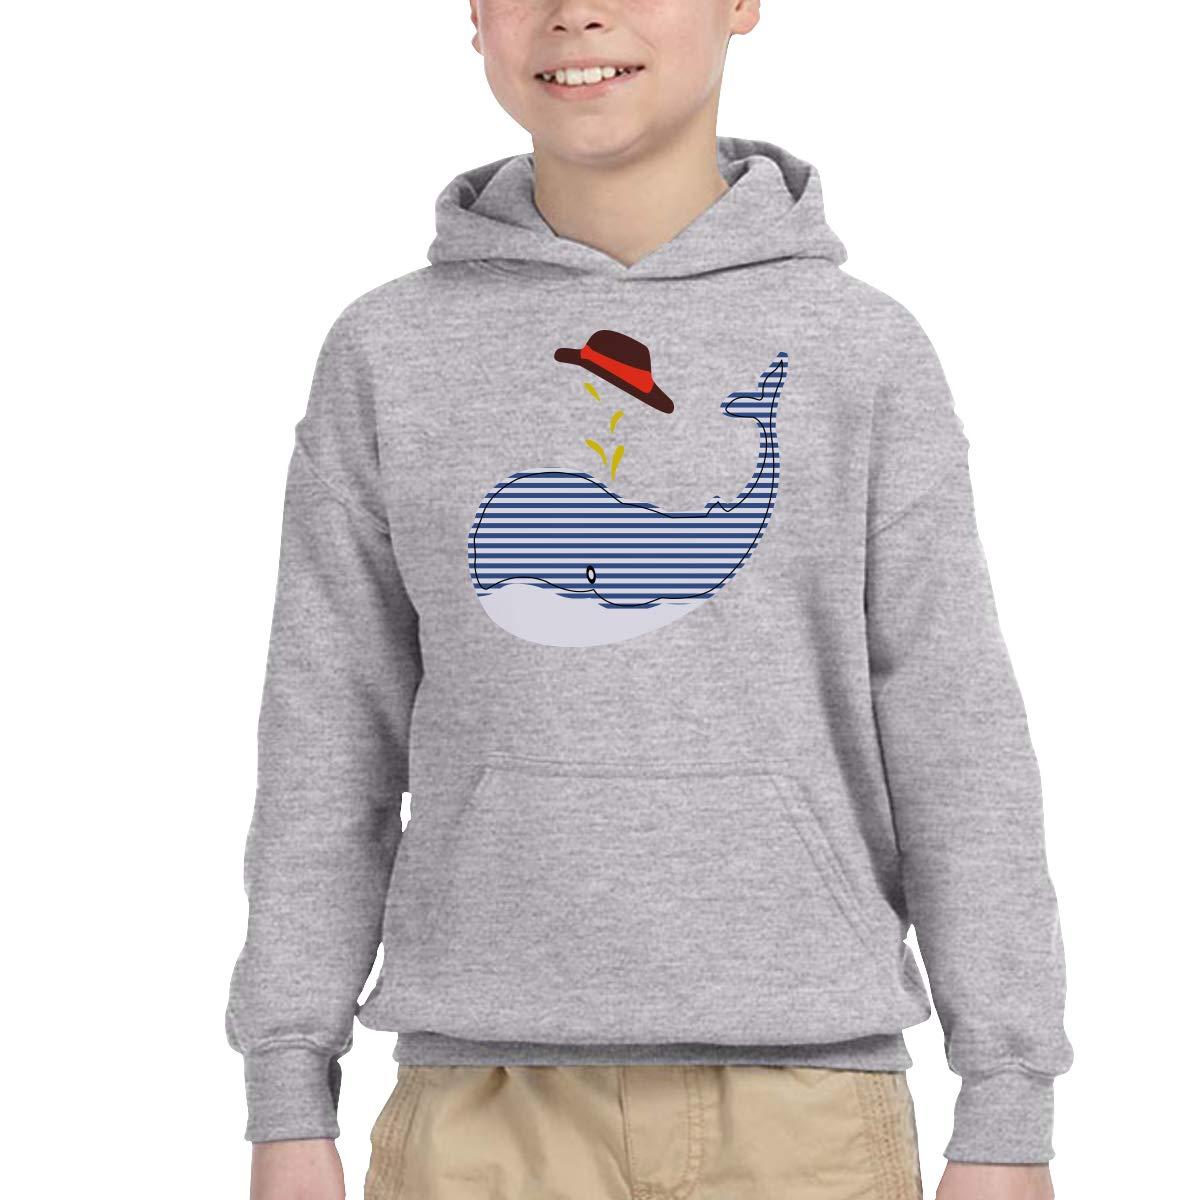 WER7 Kids Boys Girls 3D Print Athletic Pullover Fashion Hoodie Hooded Sweatshirts